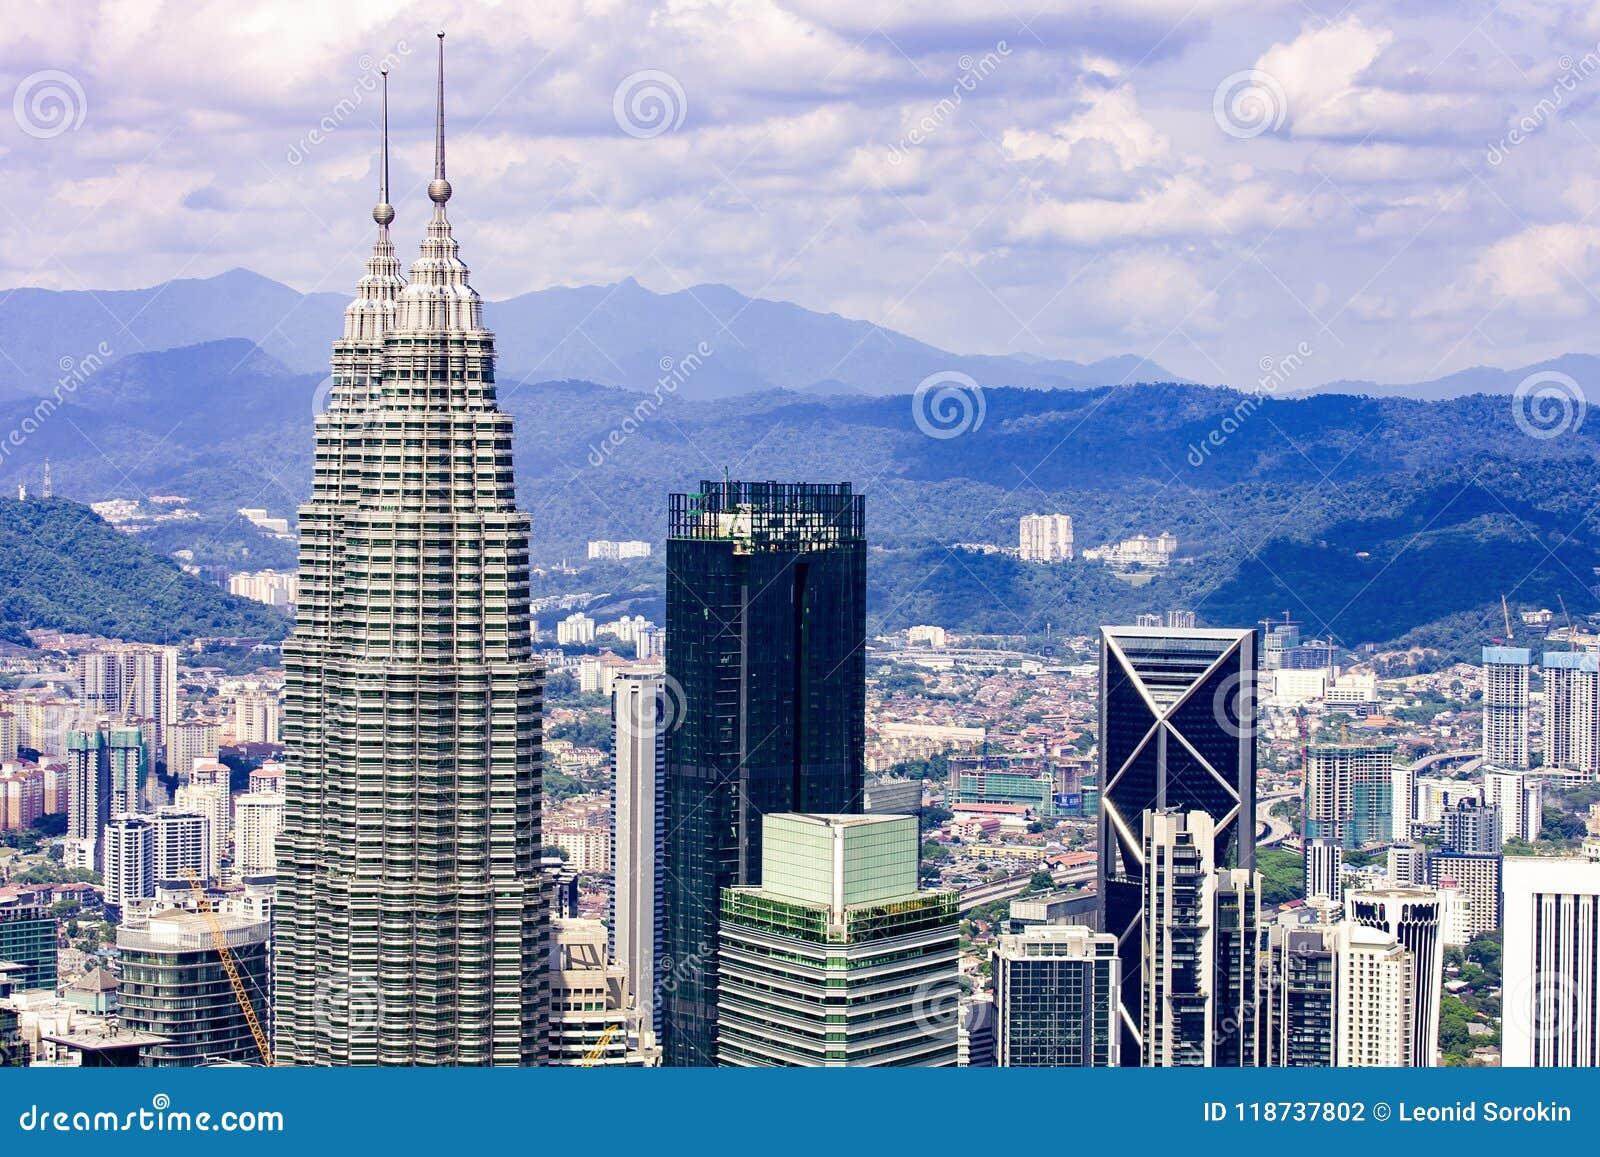 Kuala Lumpur city skyline with skyscrapers, Malaysia